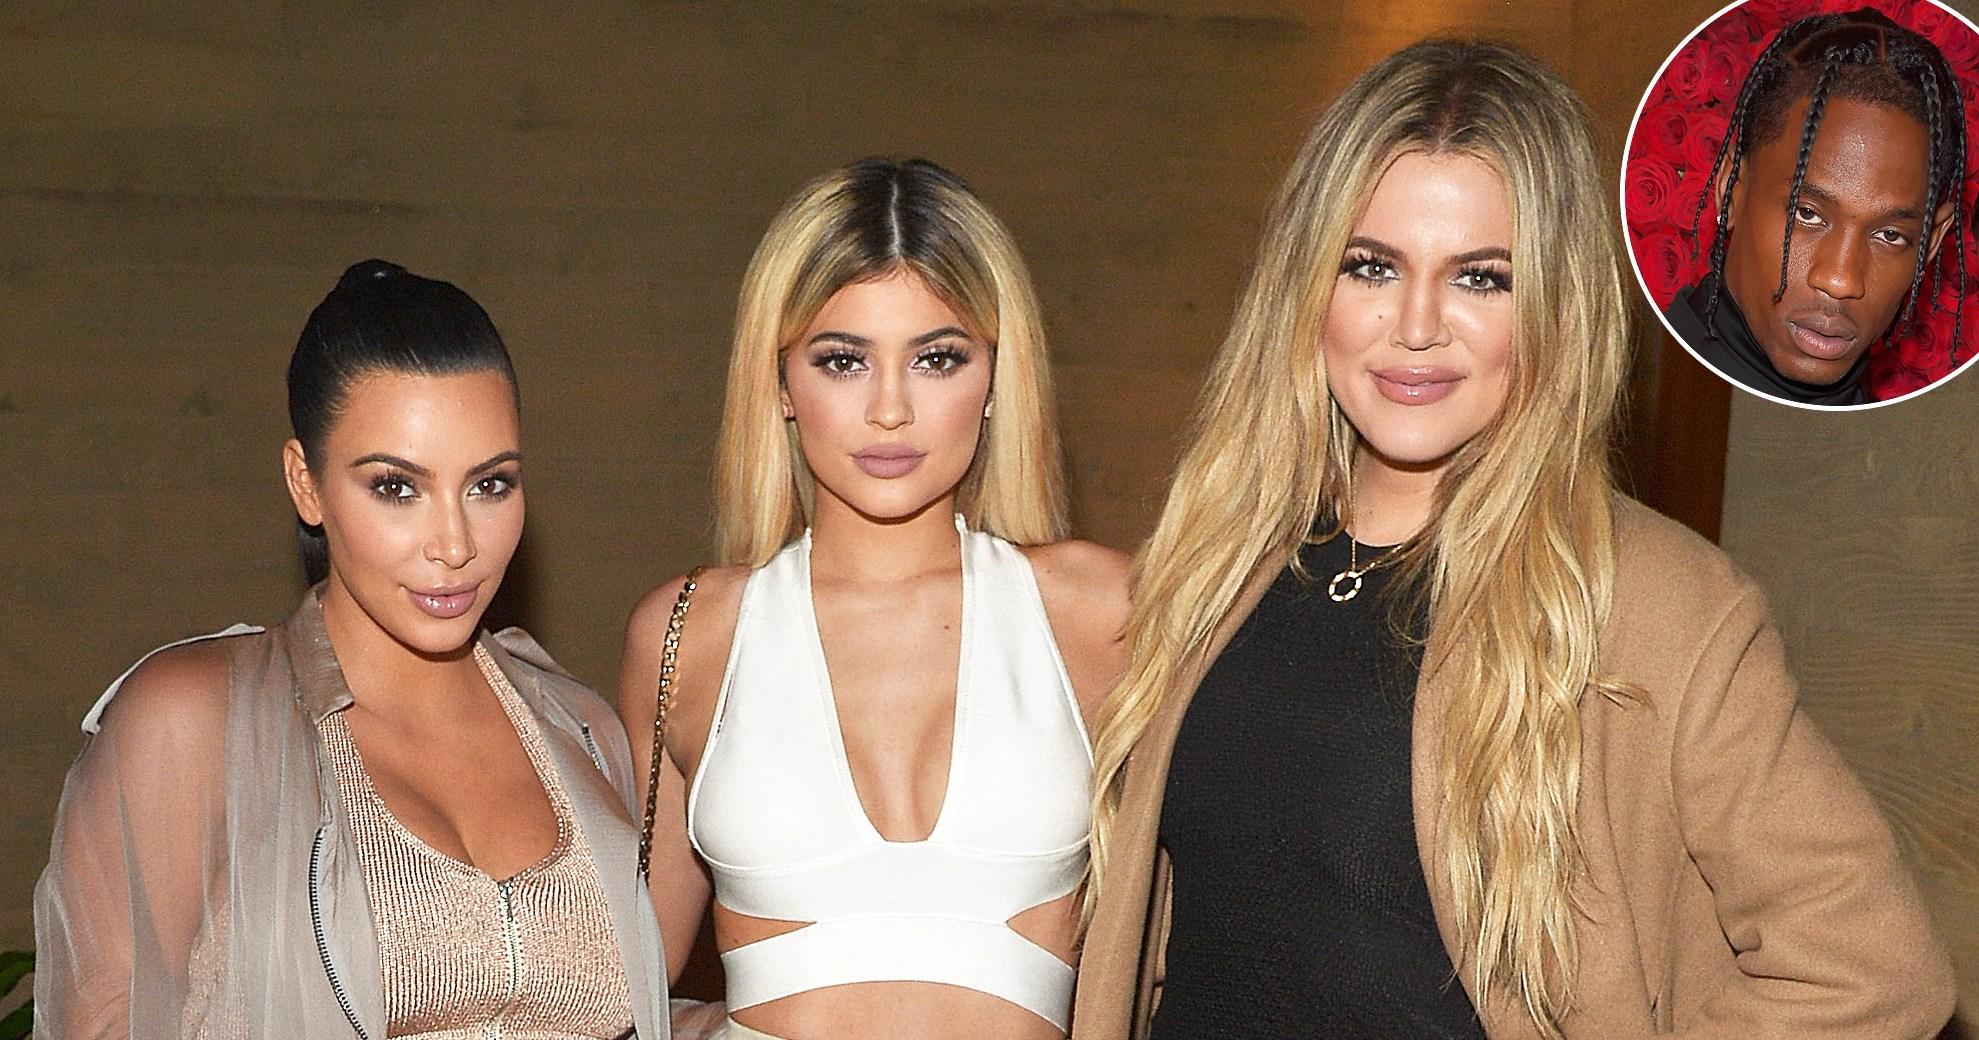 Kylie Jenner, Kim K. and Khloe Slam Travis Scott Cheating Hoax